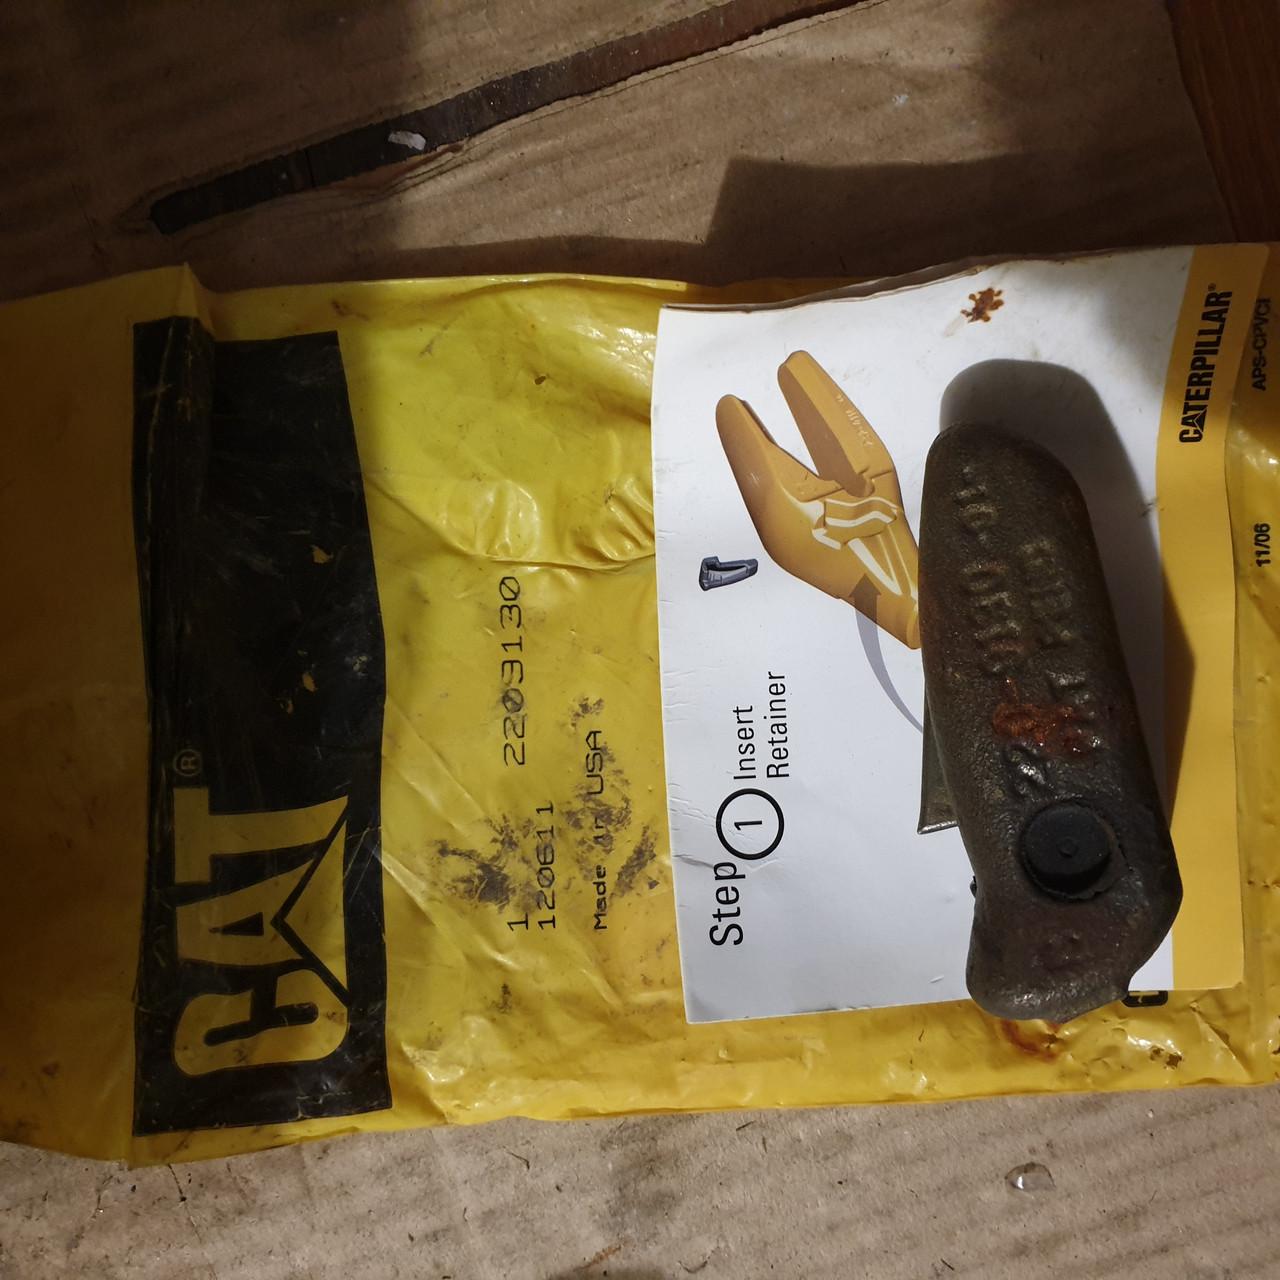 220-9130 Палец коронки ковша K130 с безударной фиксации/ Retainer fits Caterpillar®